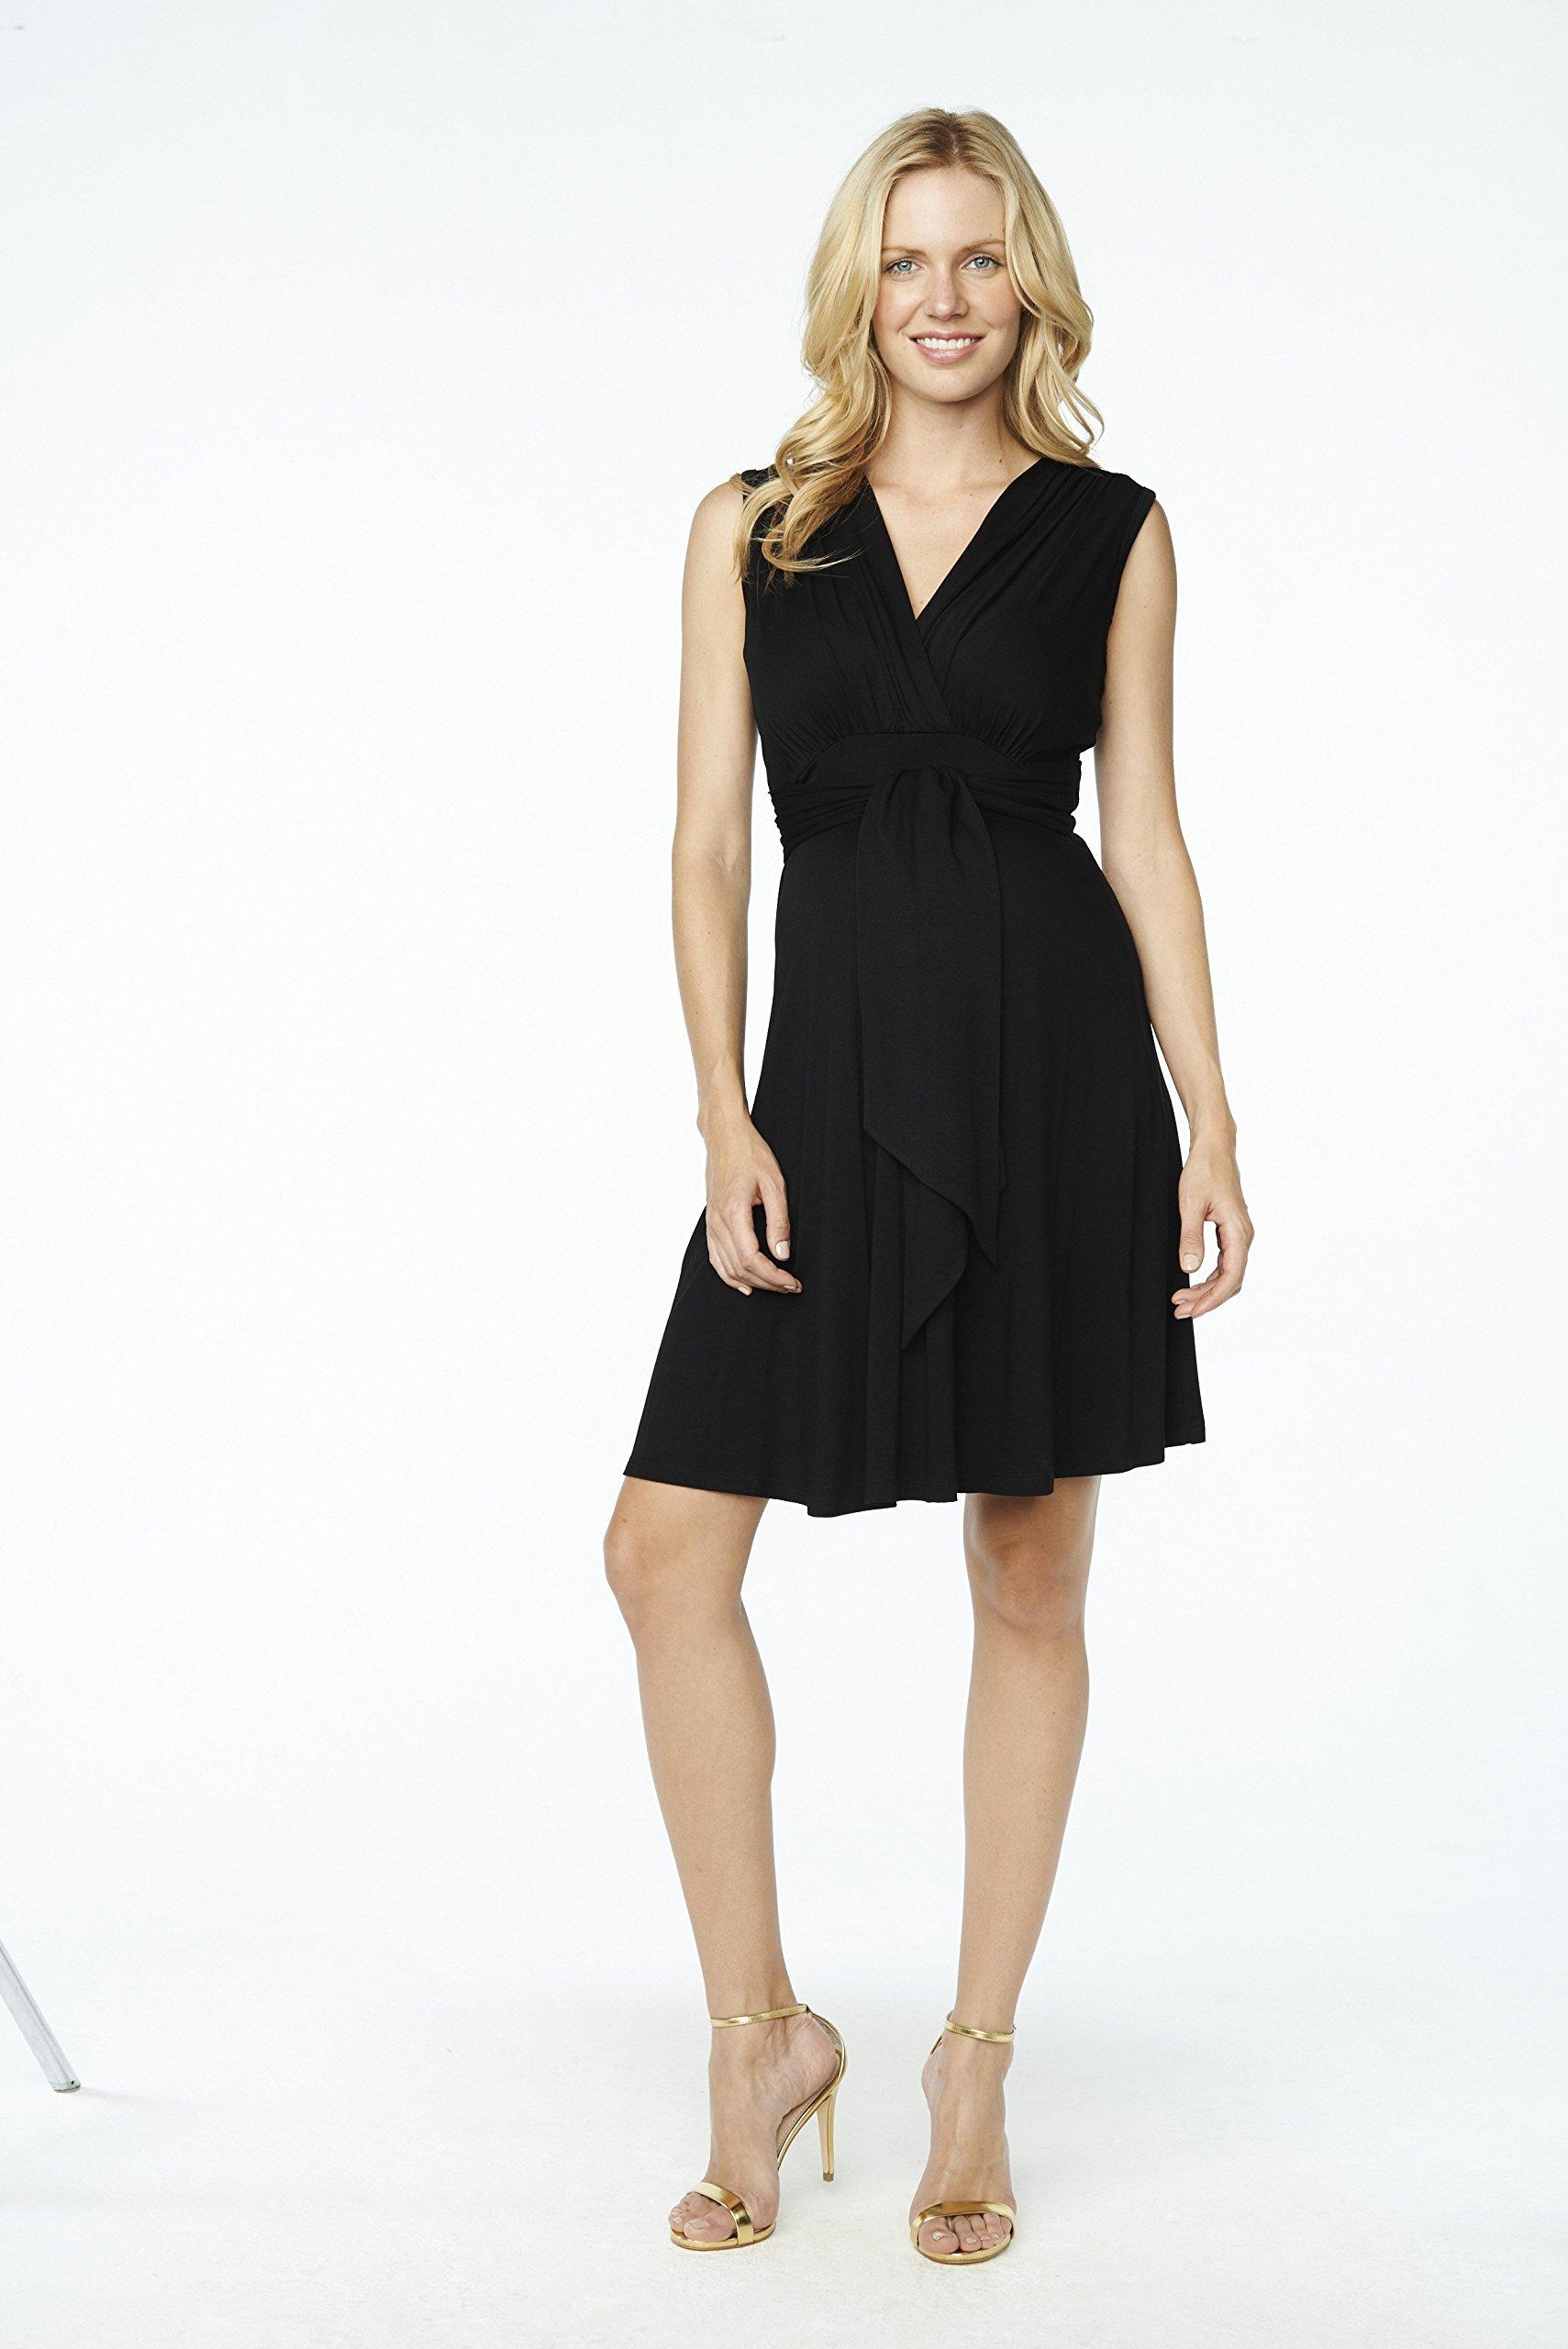 Maternal America Women's Maternity Mini Sleeveless Front Tie Dress, Black, Medium by Maternal America